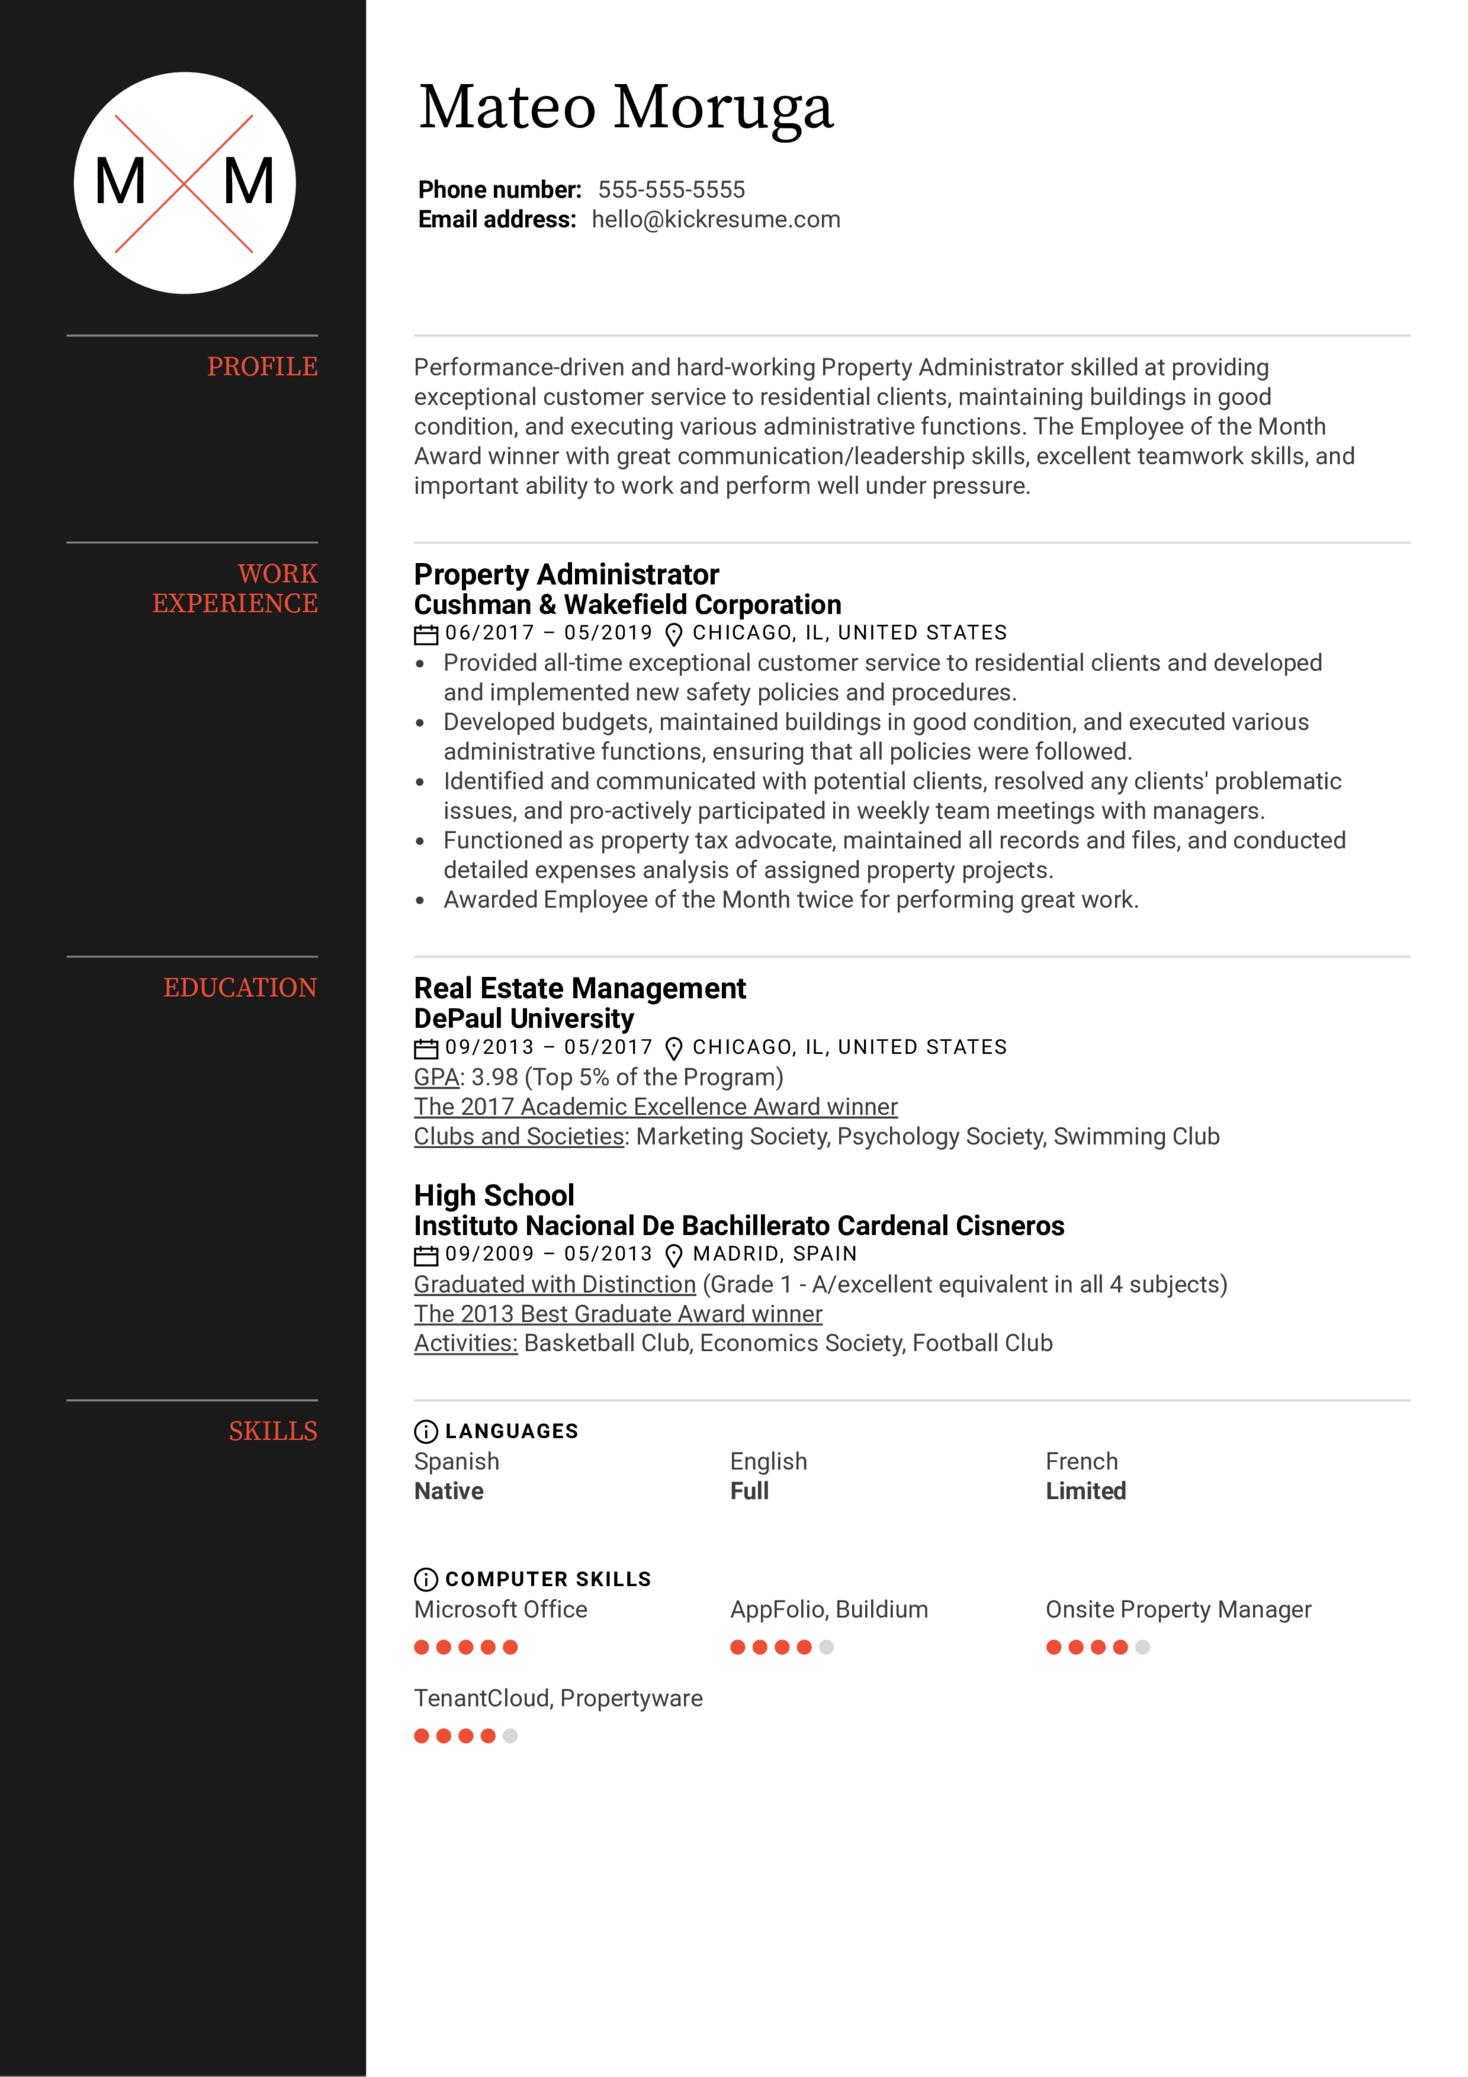 Property Administrator Resume Sample (parte 1)